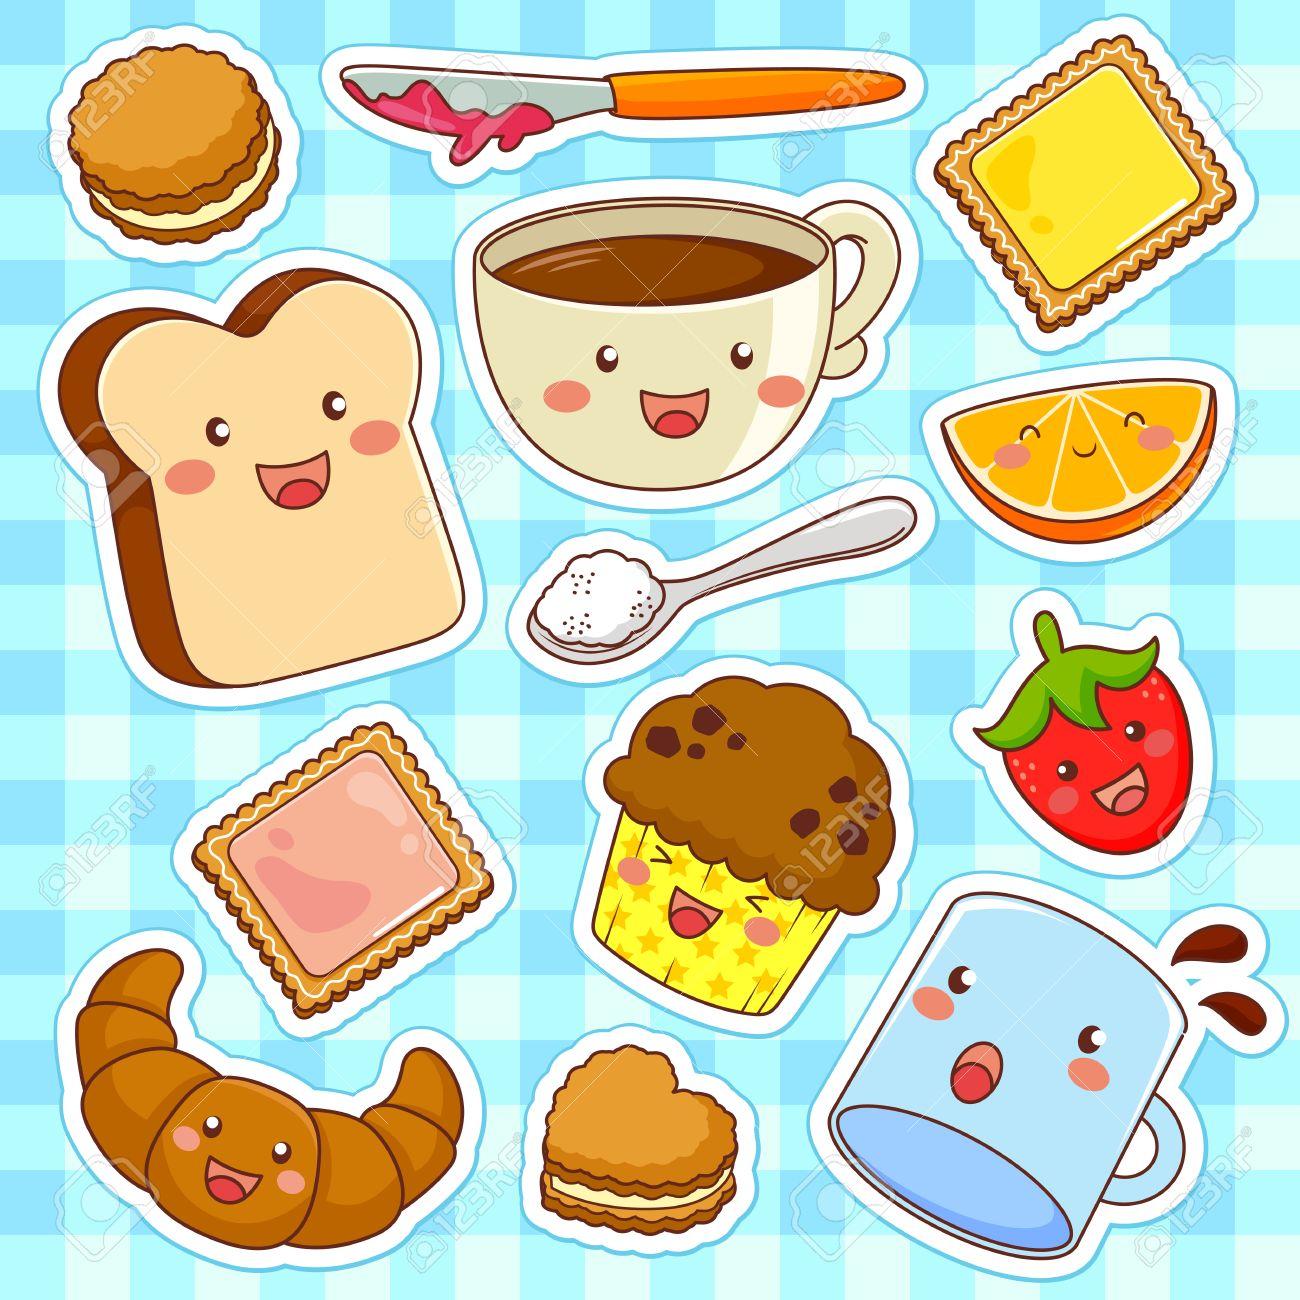 Foto de archivo , alimentos lindo estilo de dibujos animados kawaii